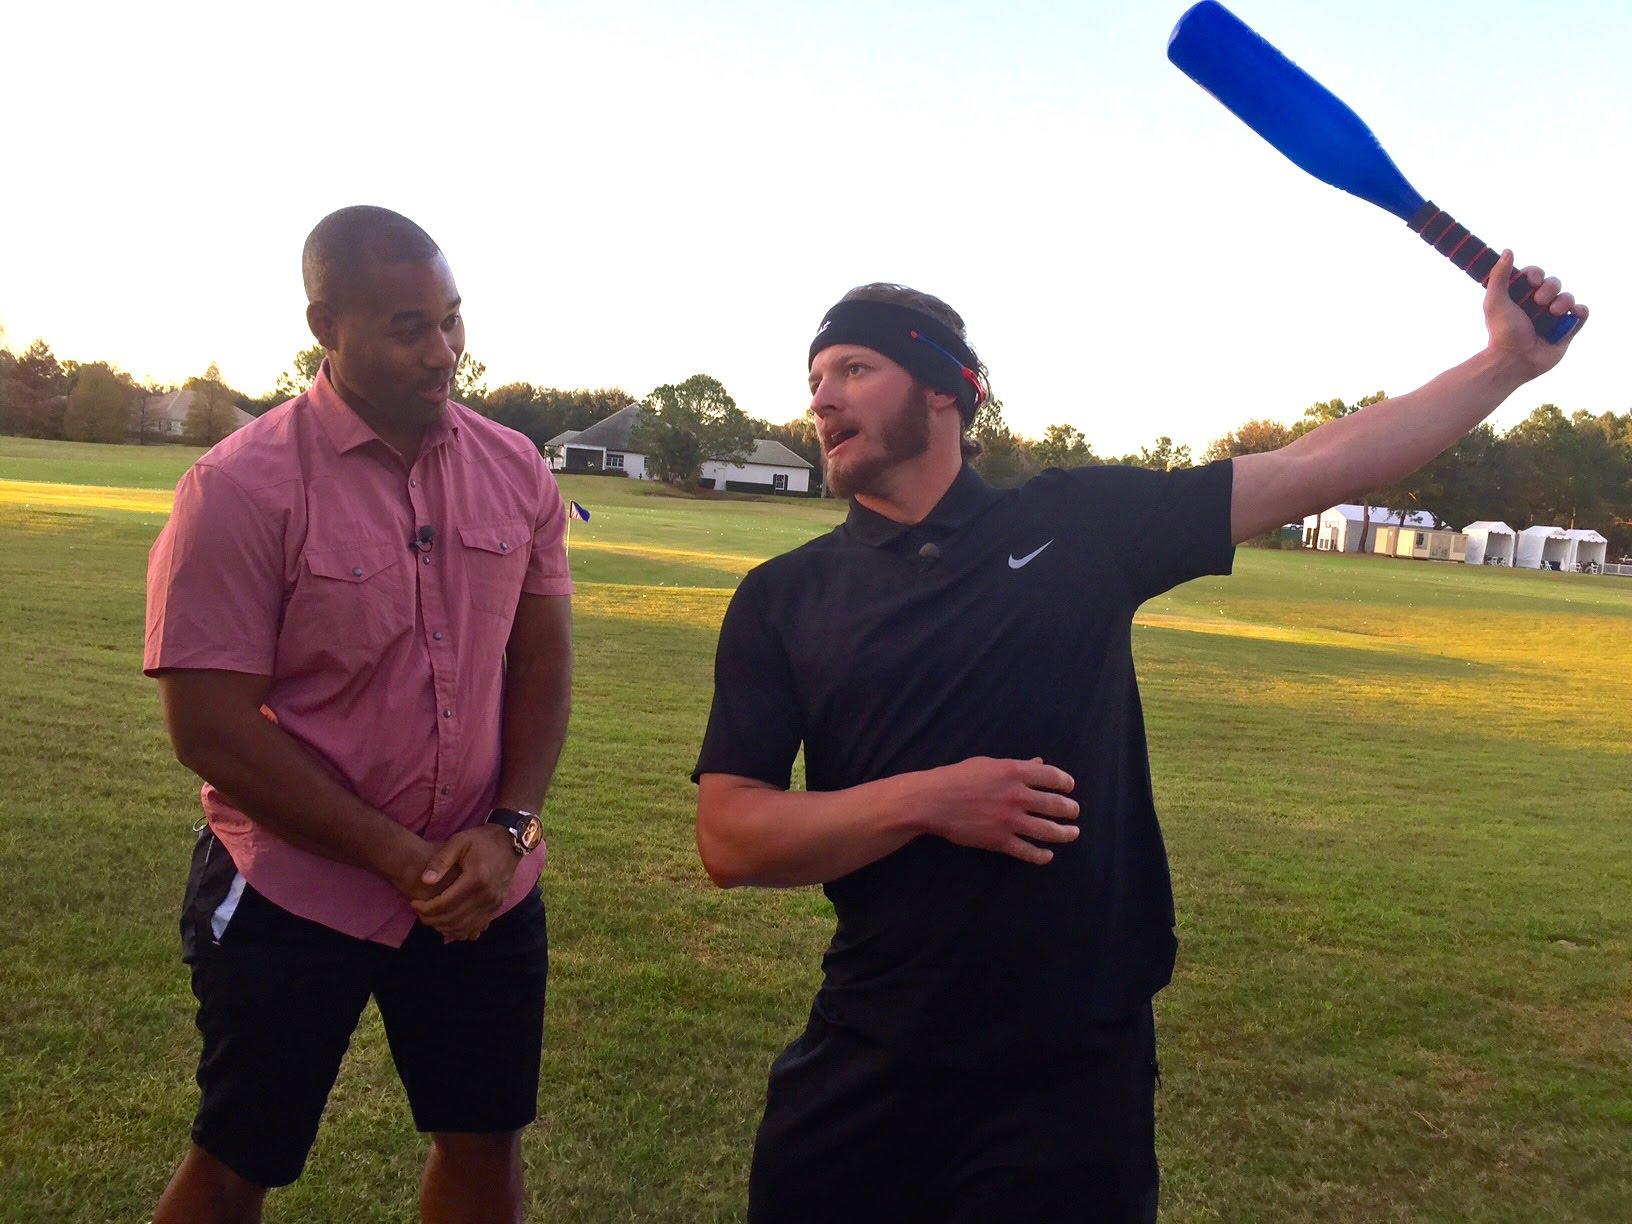 Josh Donaldson previews his new bat flip with Cabbie